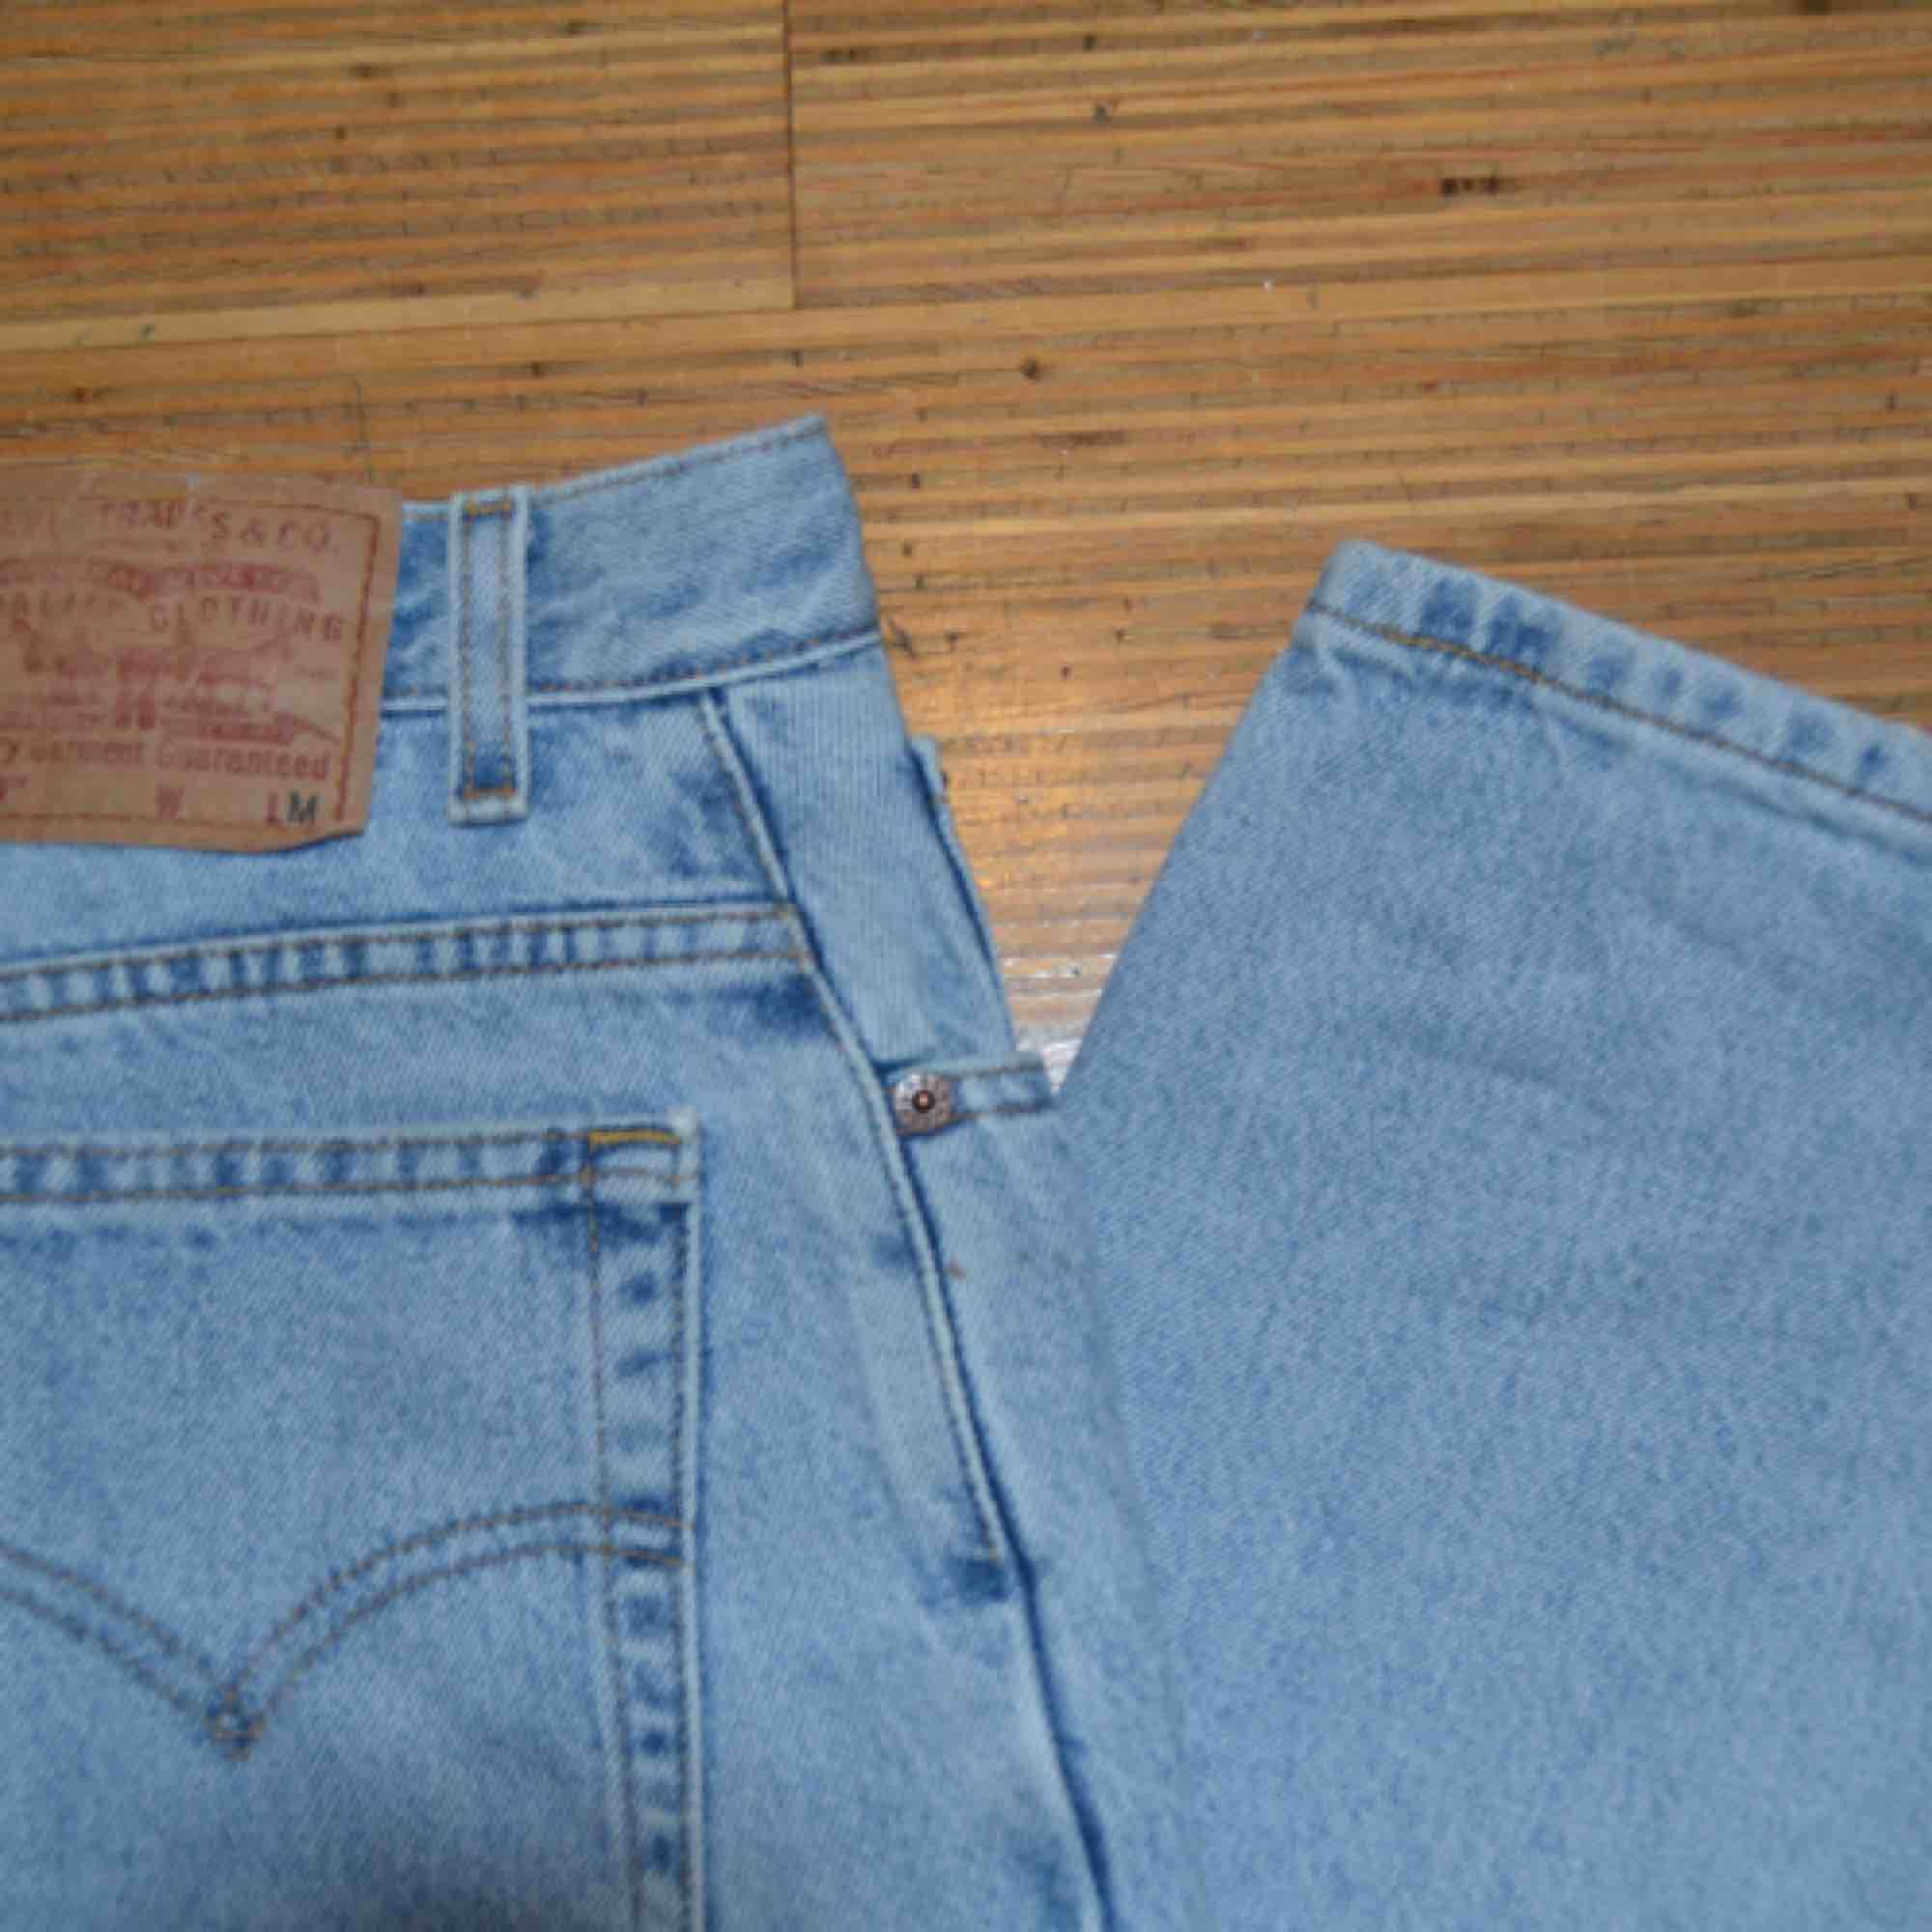 Jeans från Levis Rak modell m liten fläck. Jeans & Byxor.